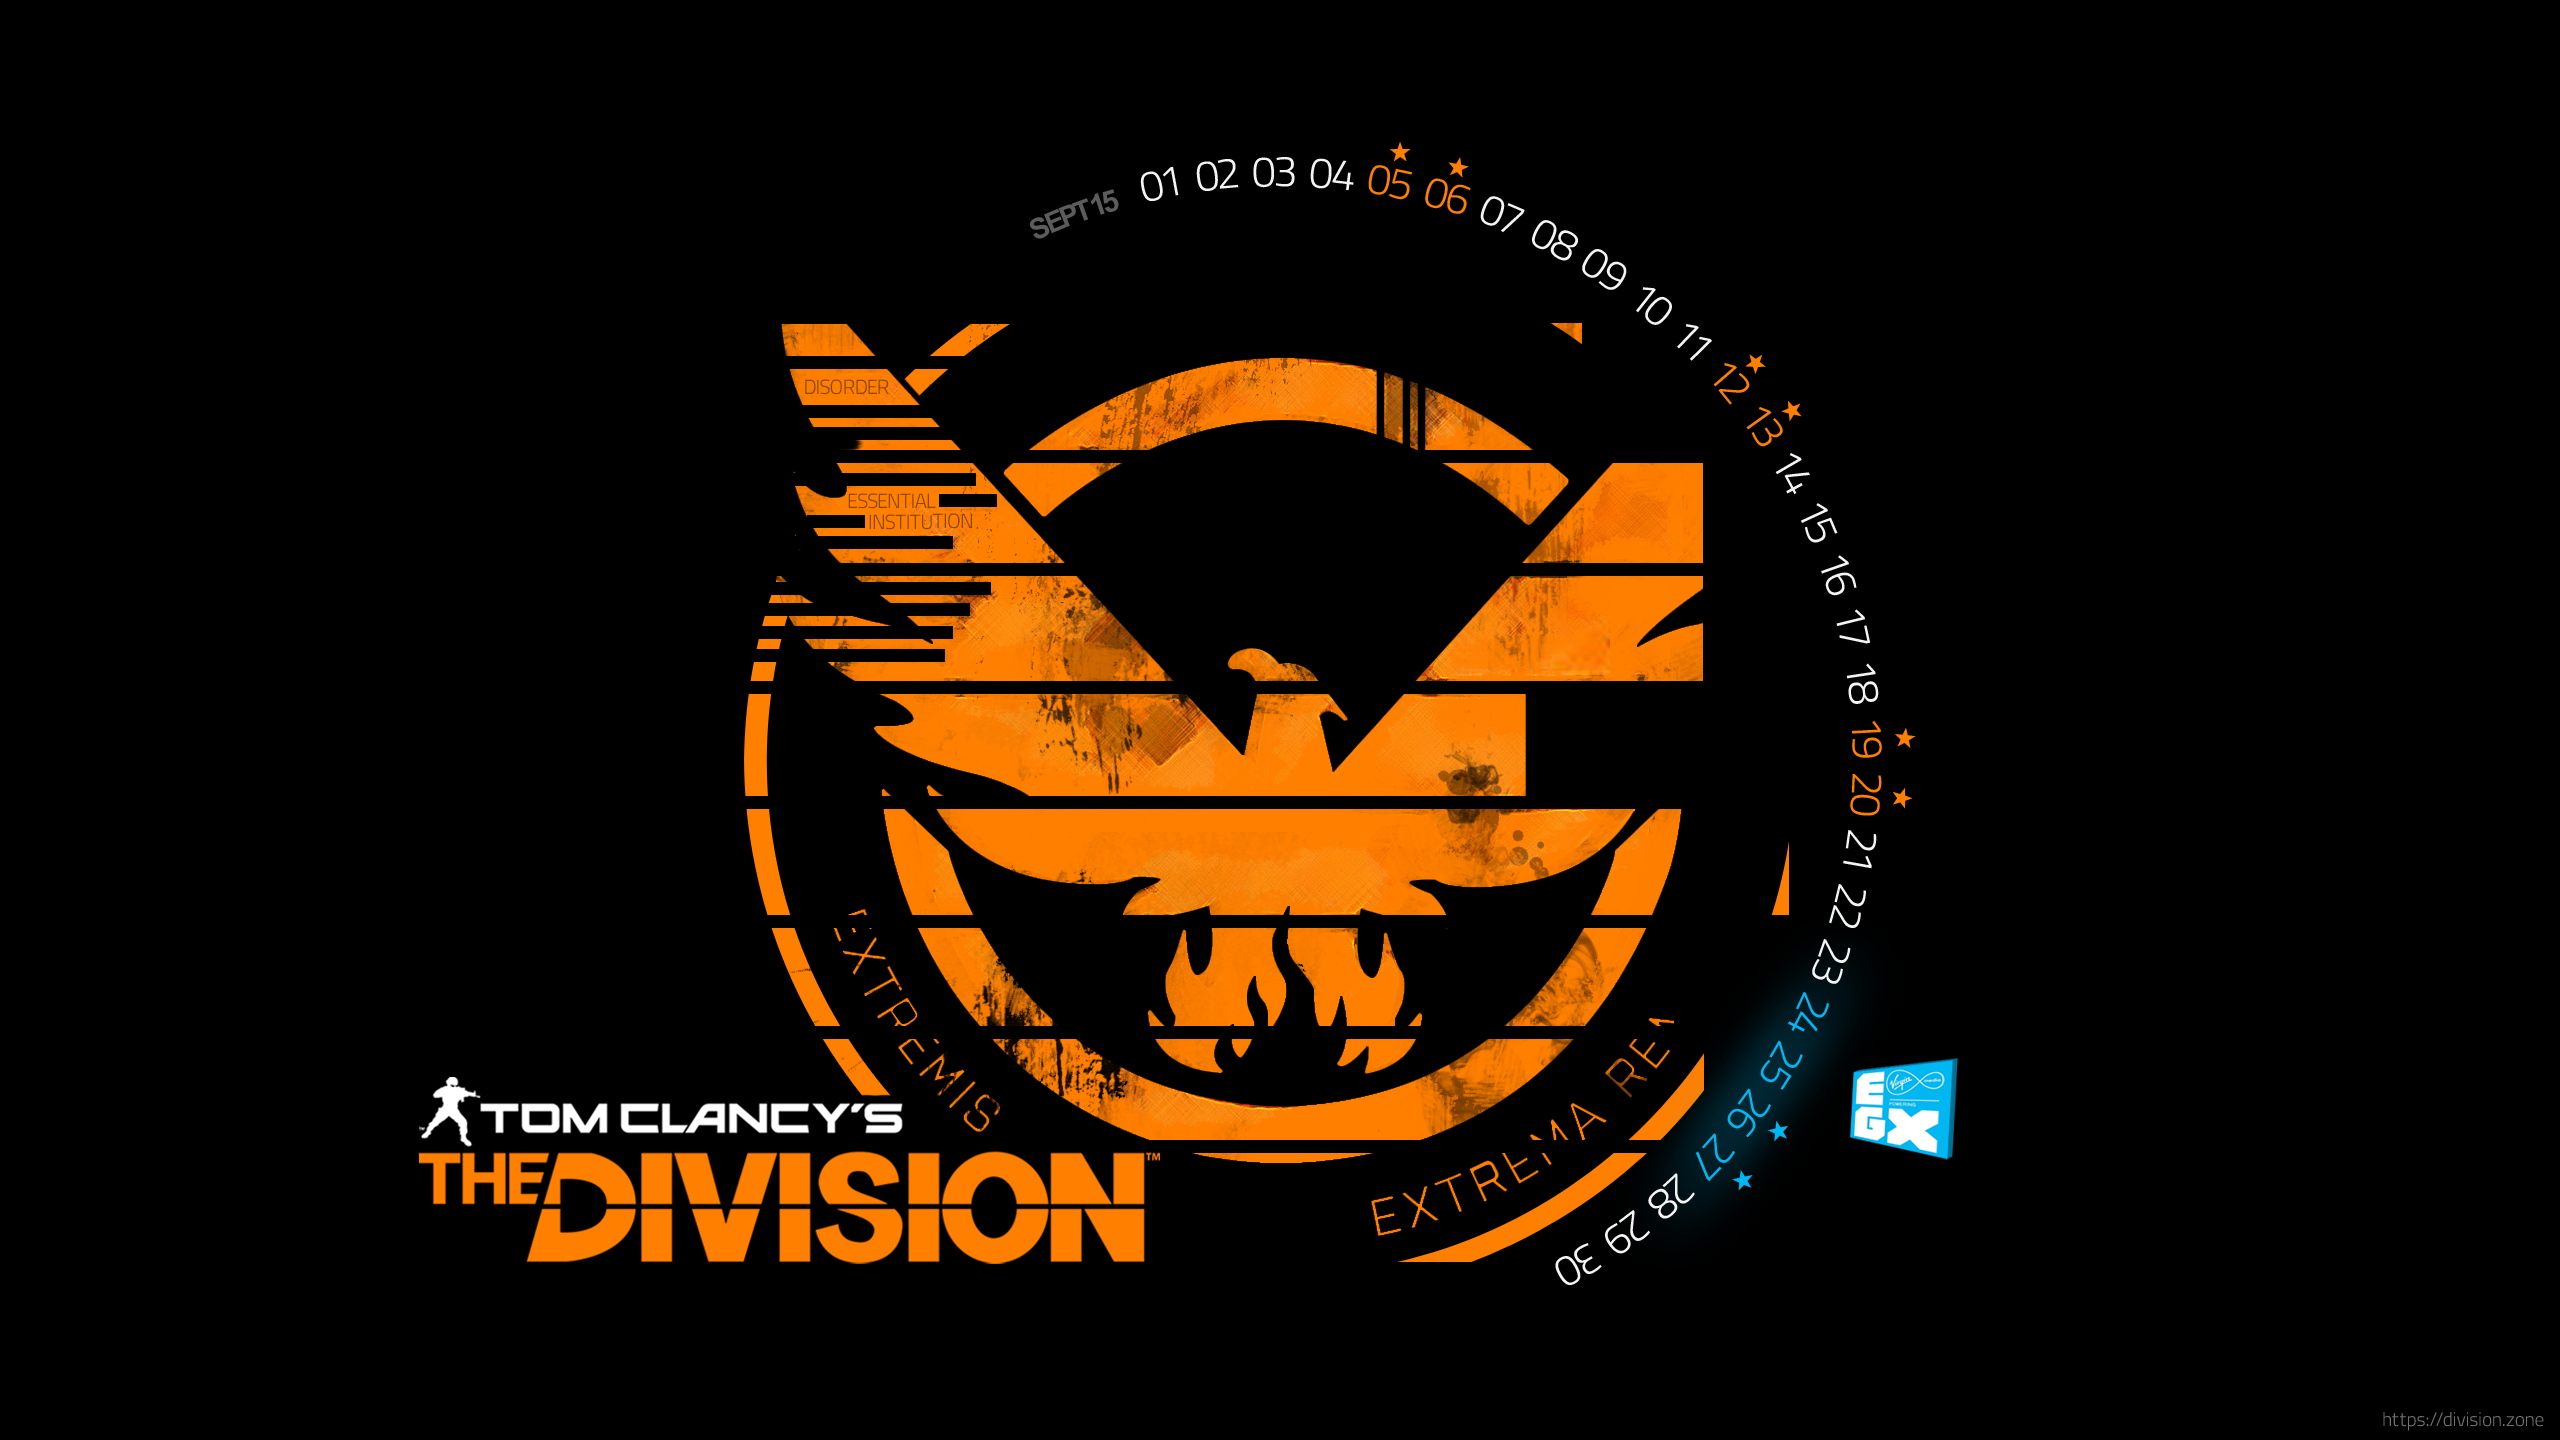 The Division Calendar 09 15 Wallpaper 2560x1440png 2560x1440